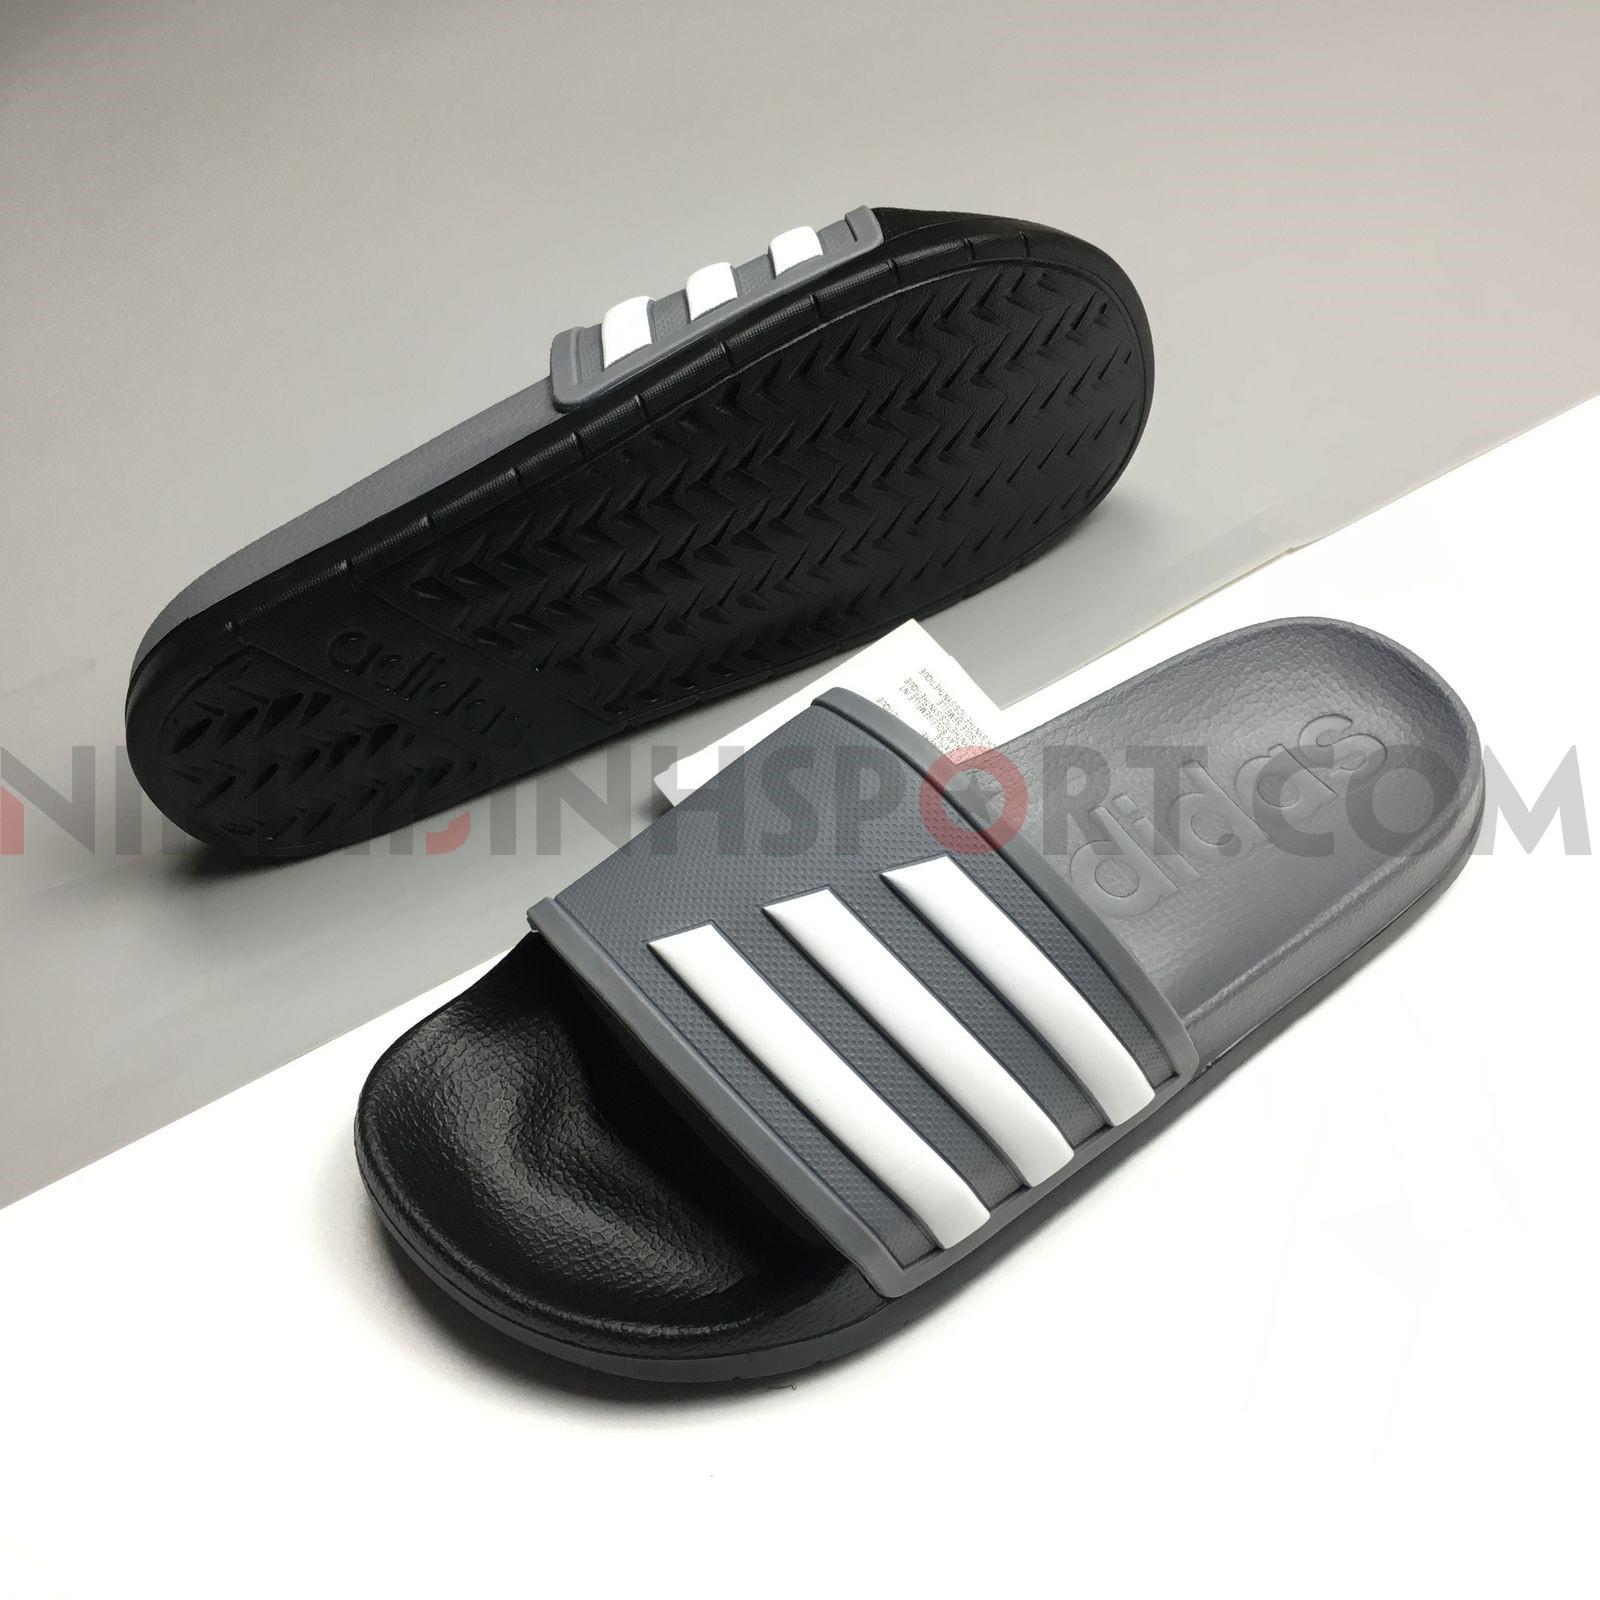 Dép thể thao nam Adidas Adilette TND Slides EG1901